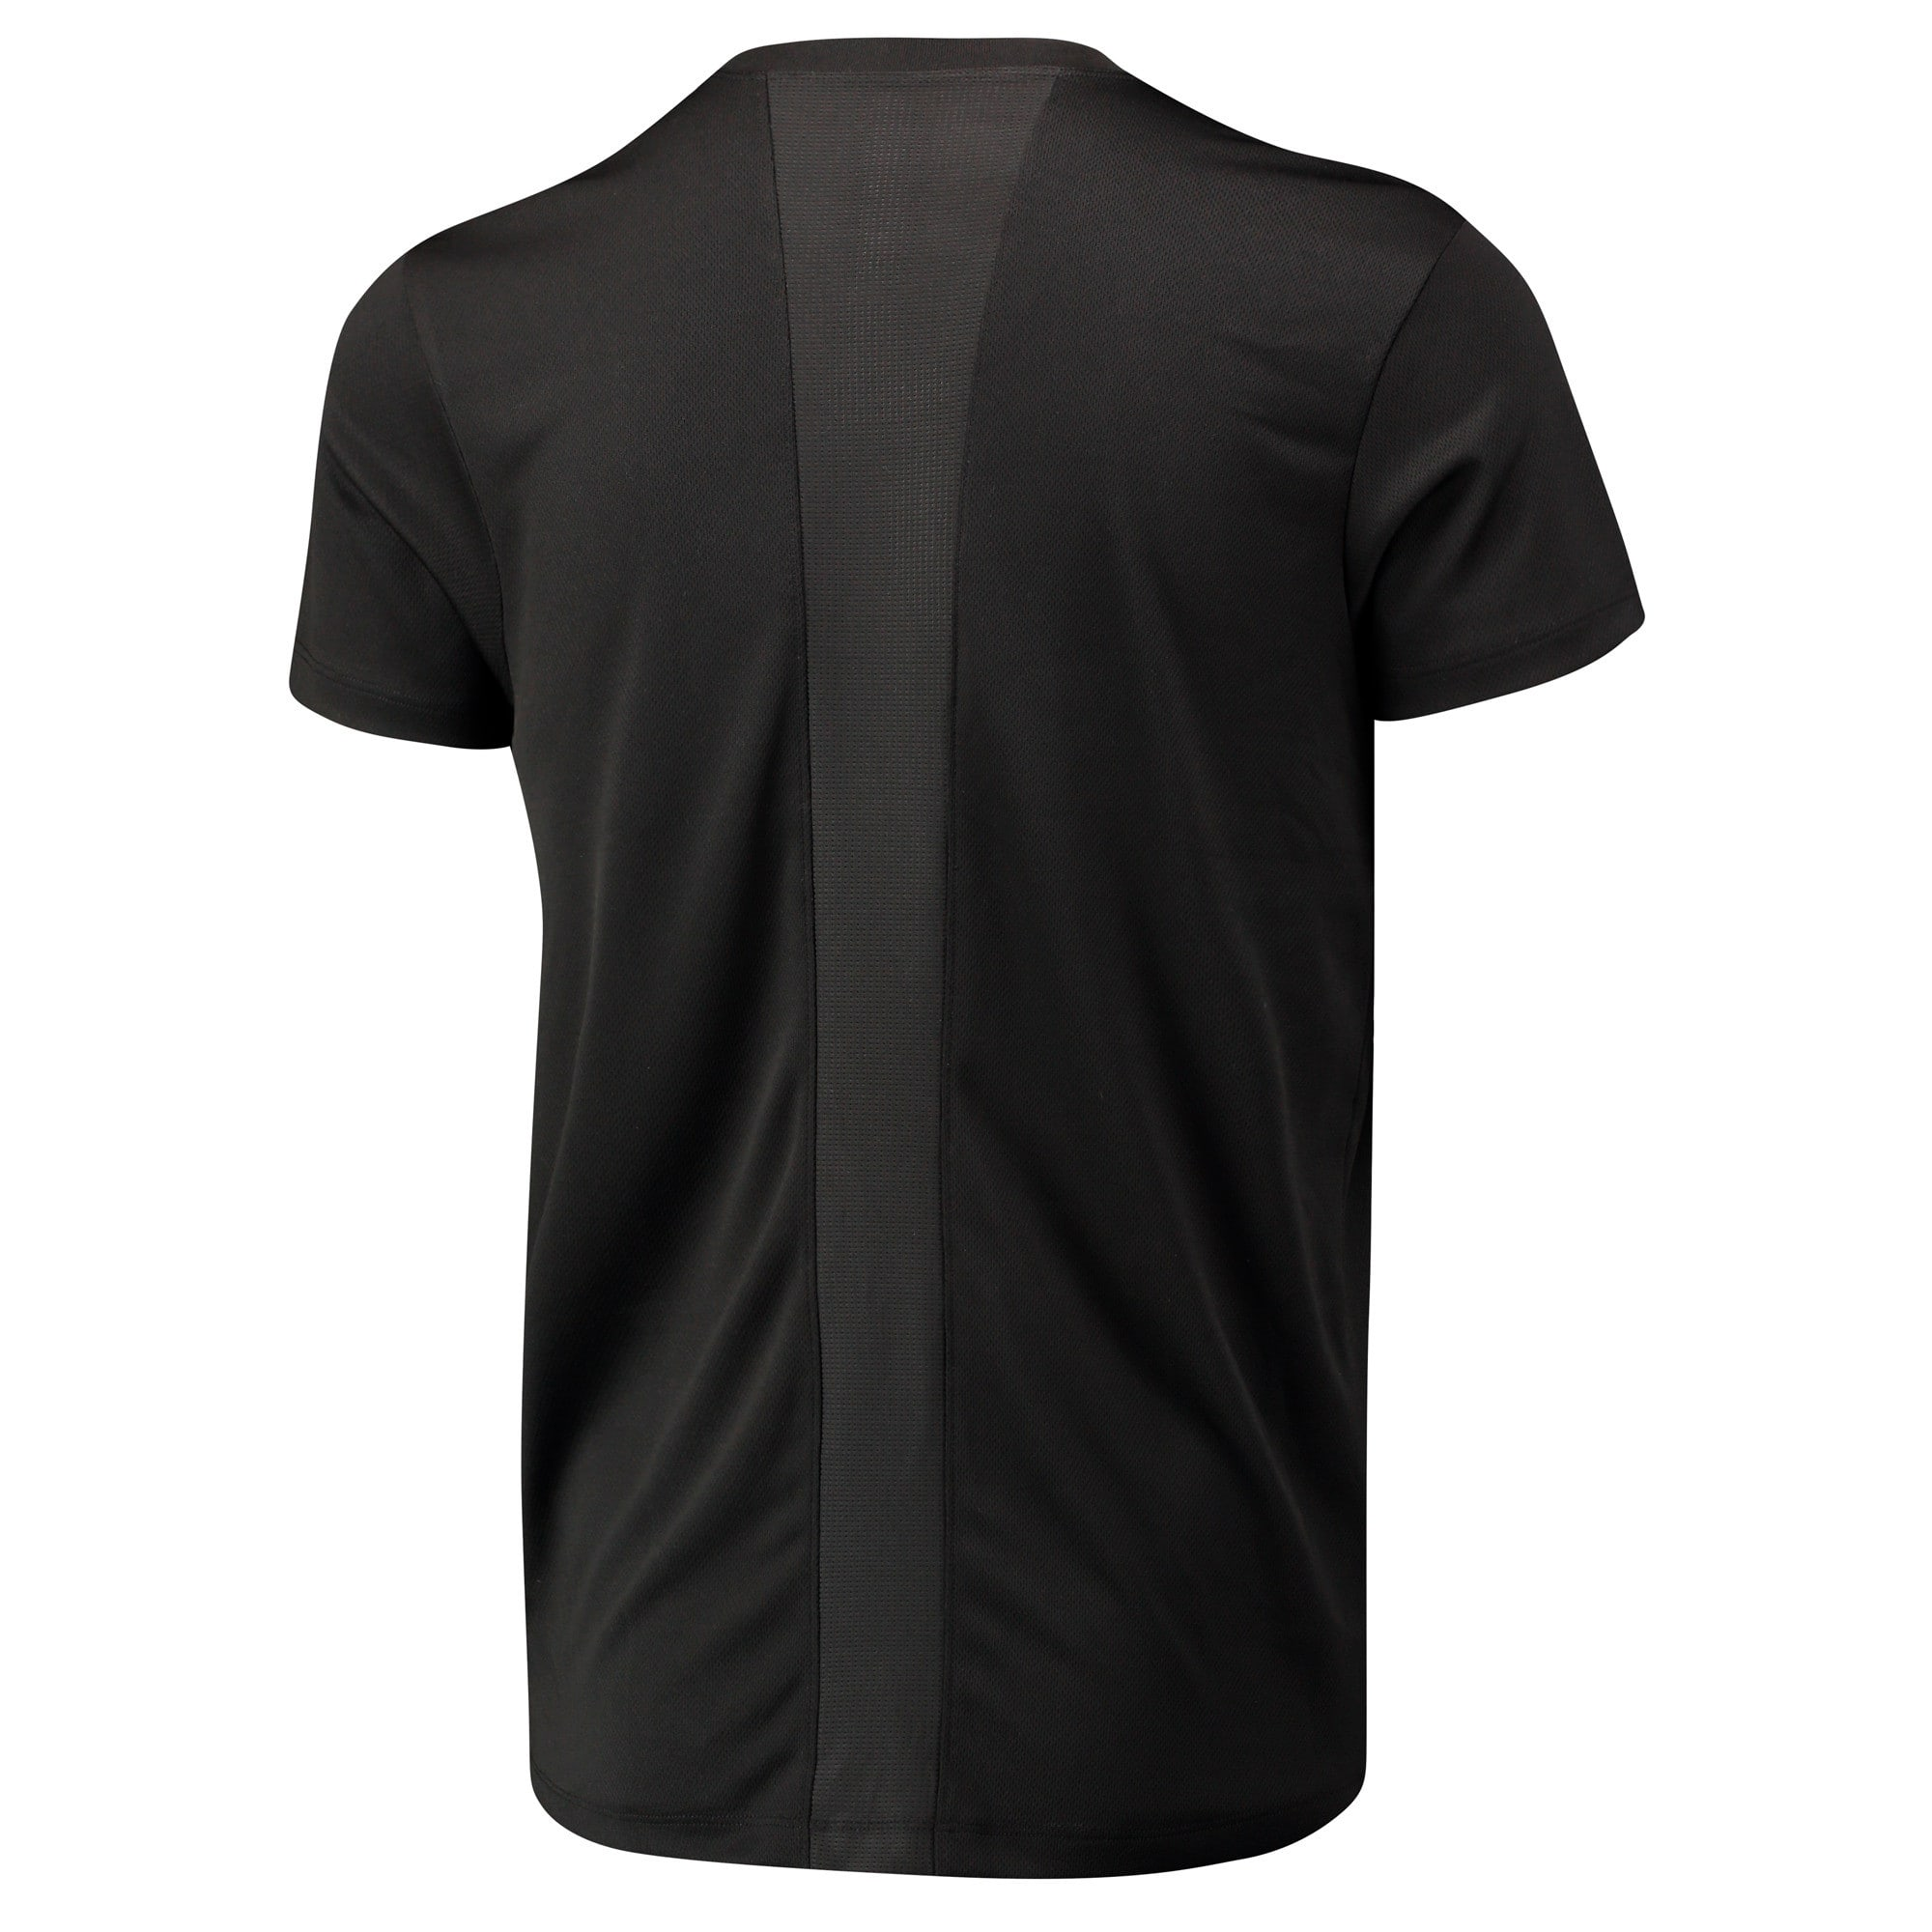 Thumbnail 4 of Active Men's Cree T-Shirt, black, medium